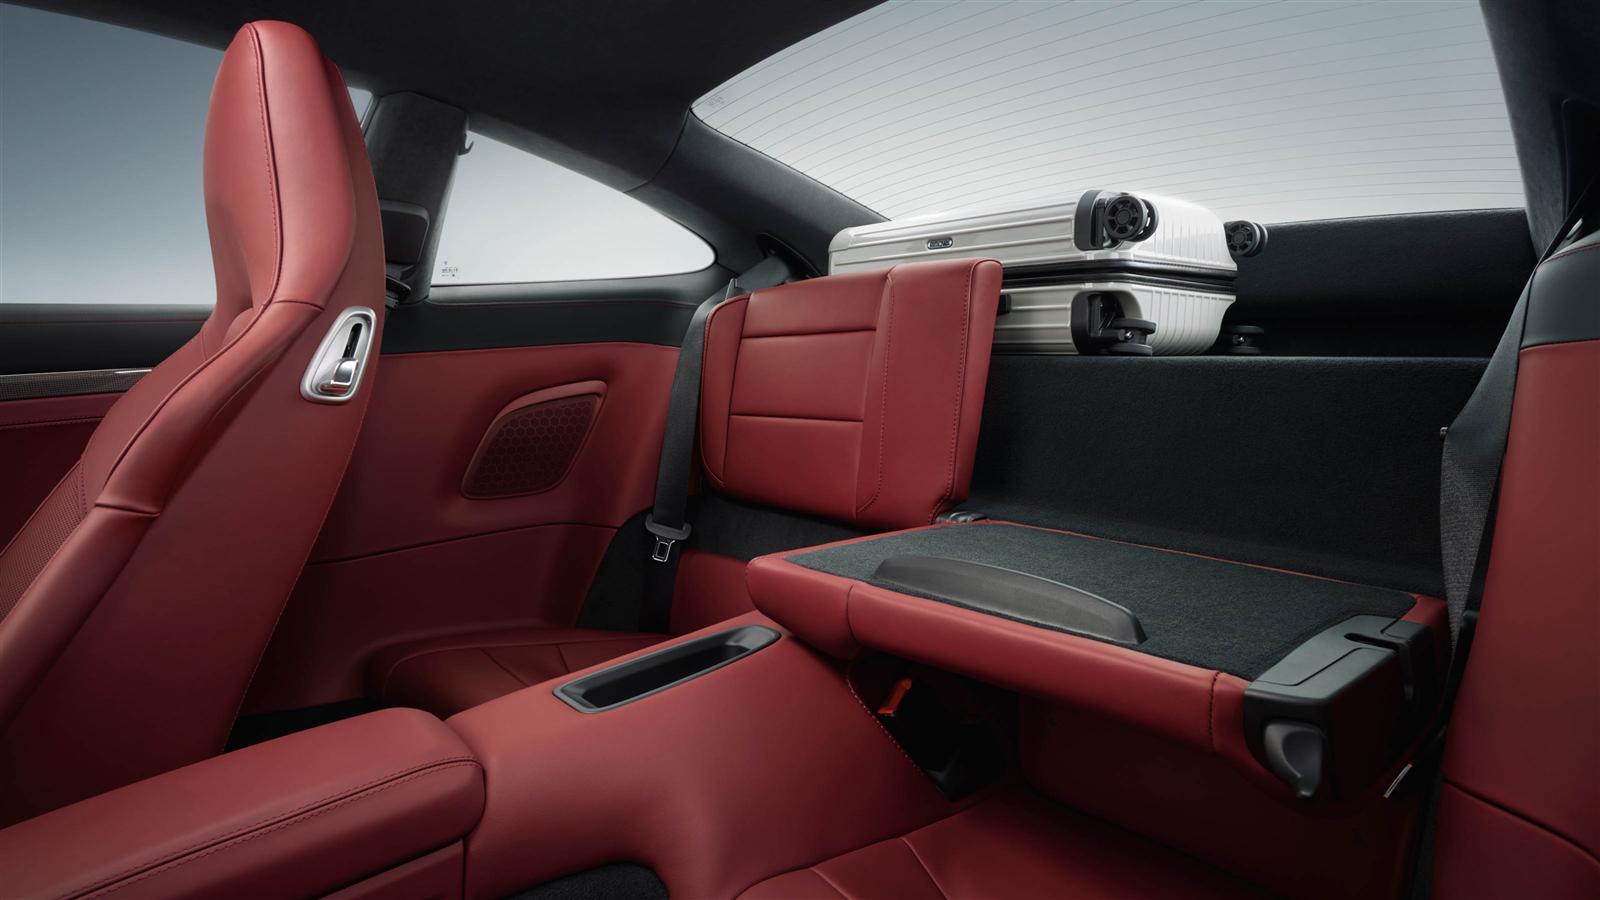 Green Buick Gmc >> PORSCHE 911 Turbo S (991.2) - 2016, 2017 - autoevolution